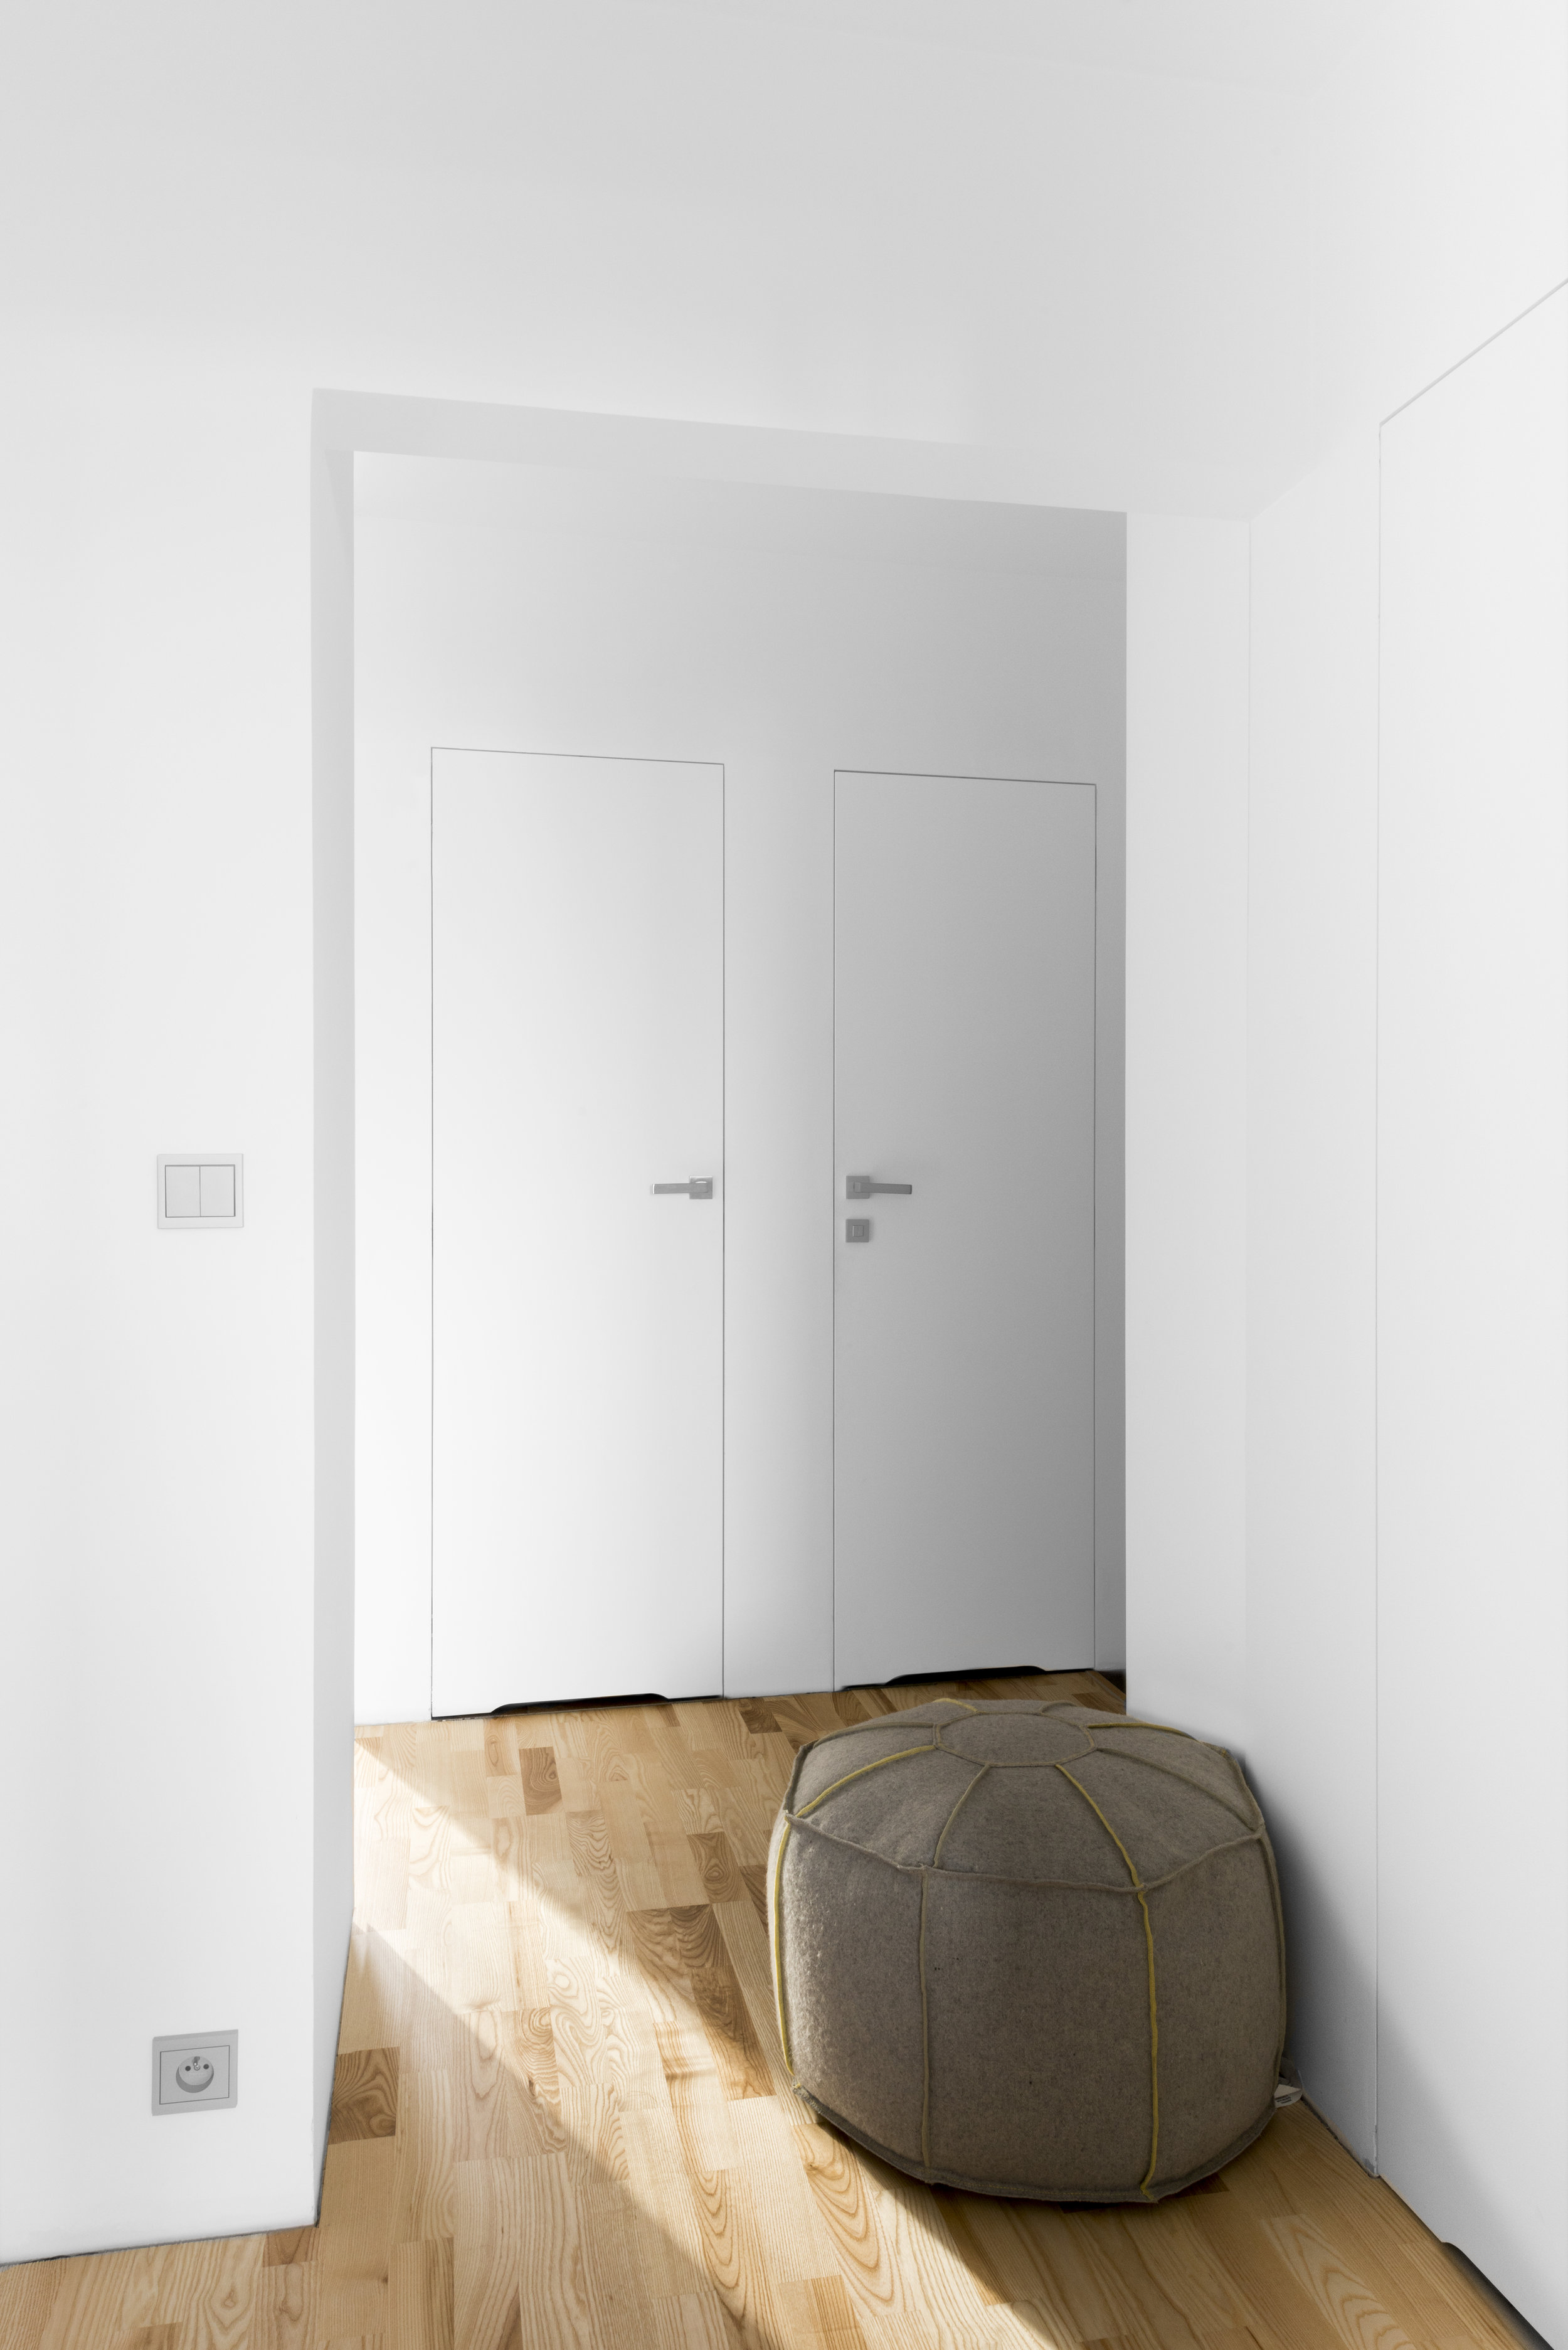 drzwi ukryte-biel we wnętrzu-berker-bo concept.jpg